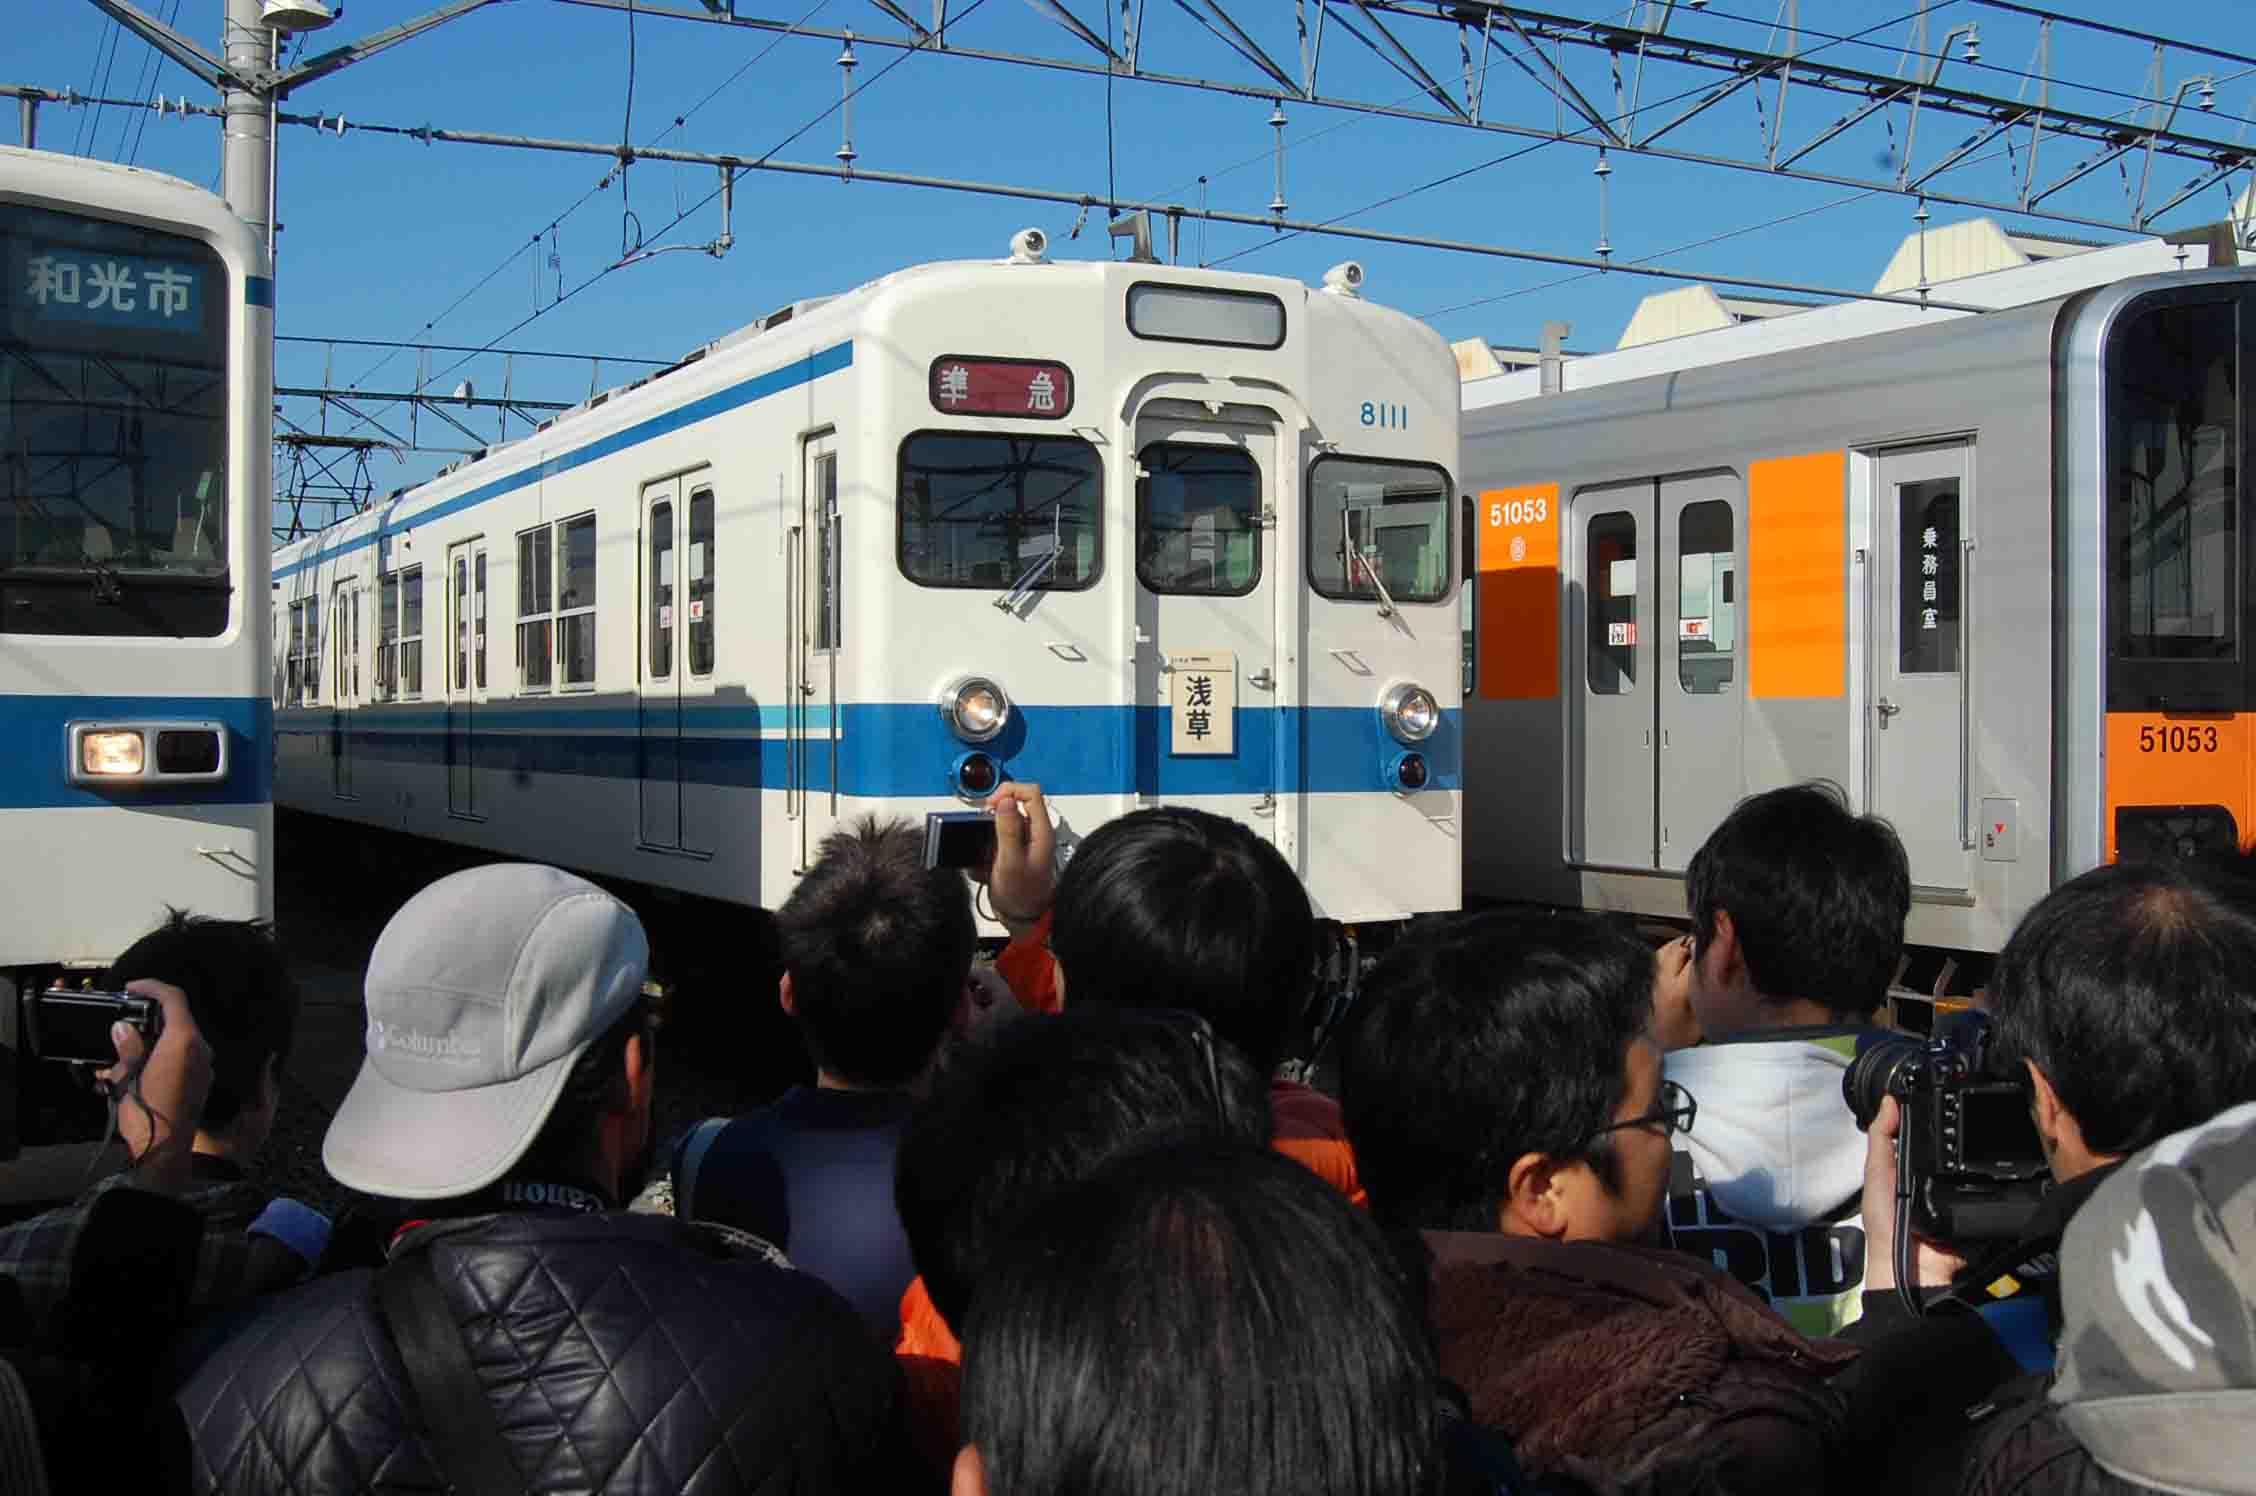 20101205南栗橋東武フェス 039A